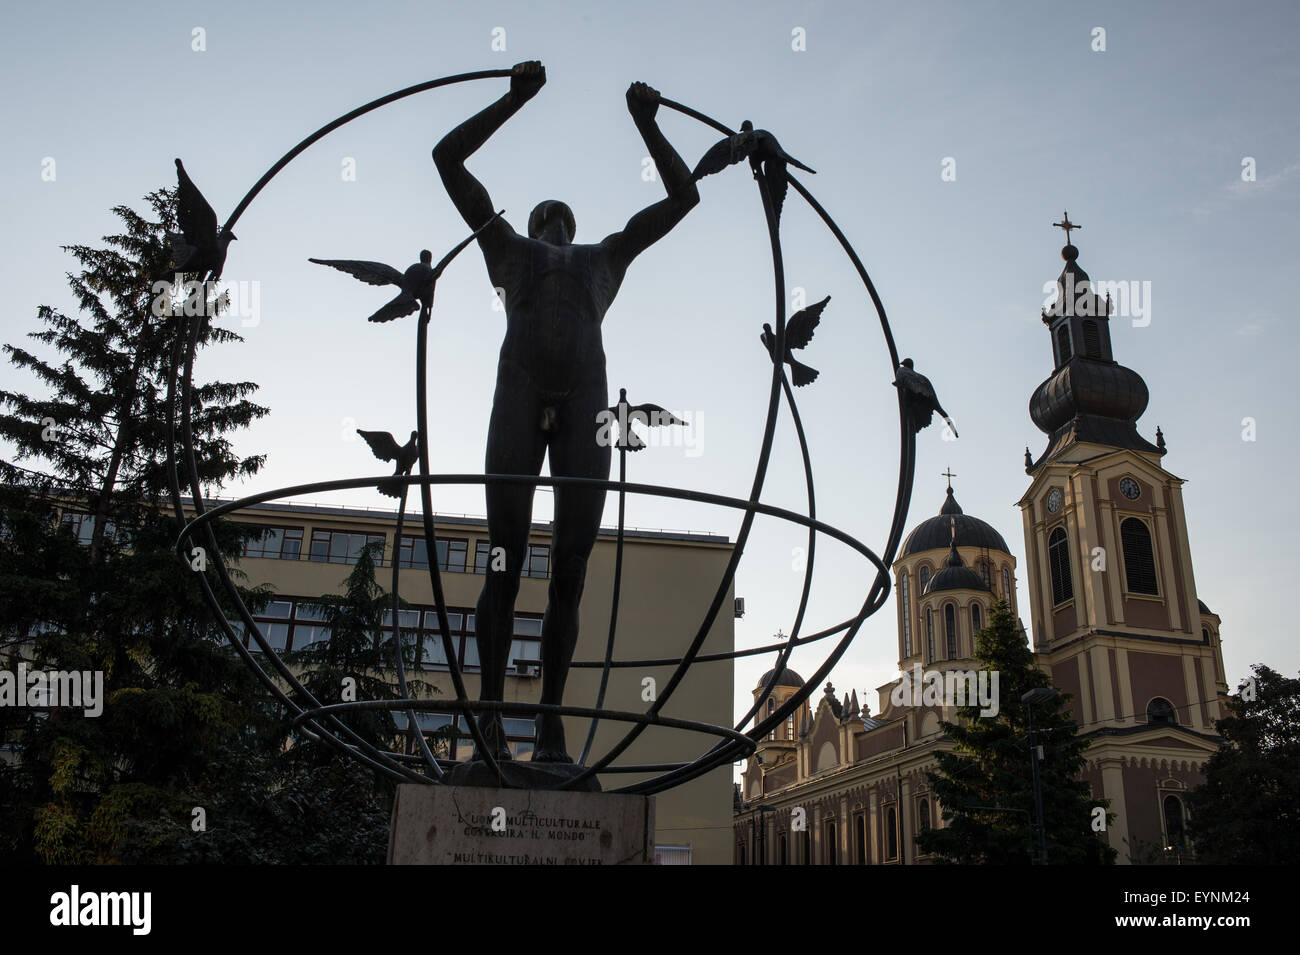 Friedensmonument, Barscarsija Bezirk, Sarajevo, Bosnien und Erzegovina Stockbild